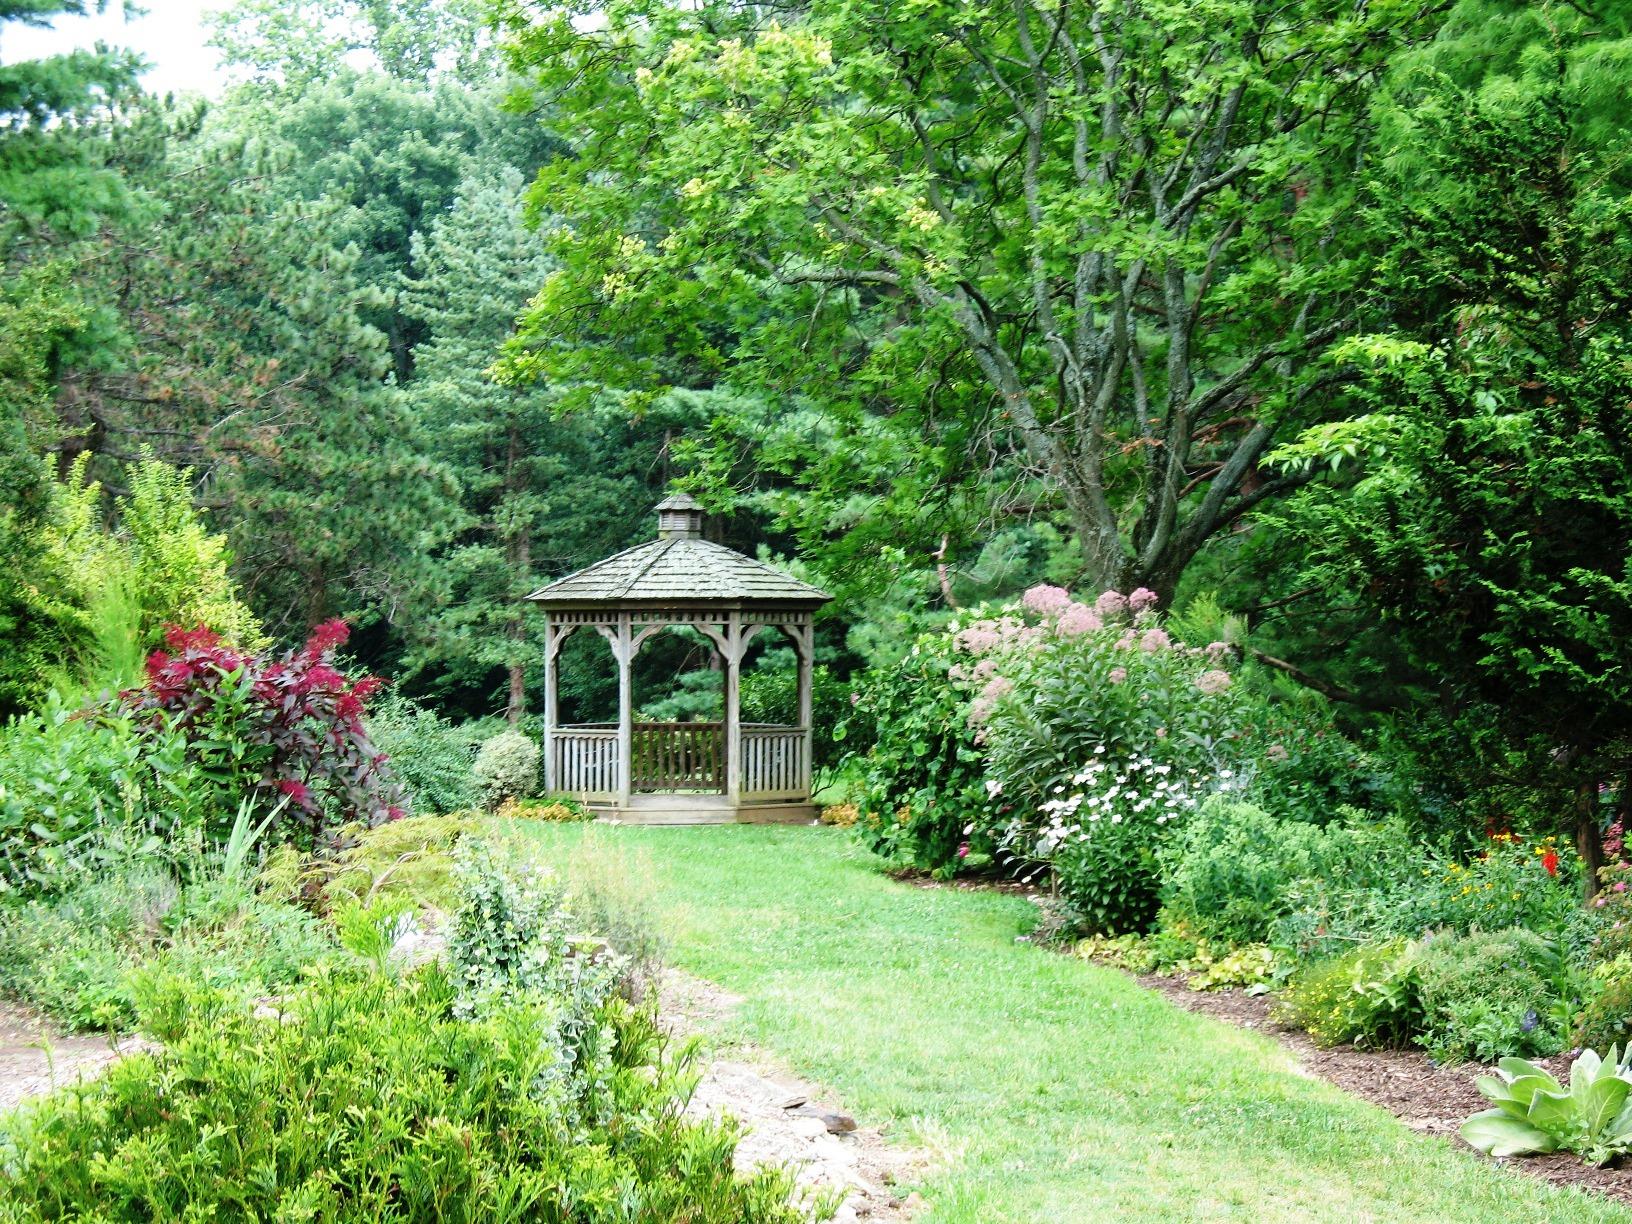 Summer Activities in Baltimore - Cylburn Arboretum